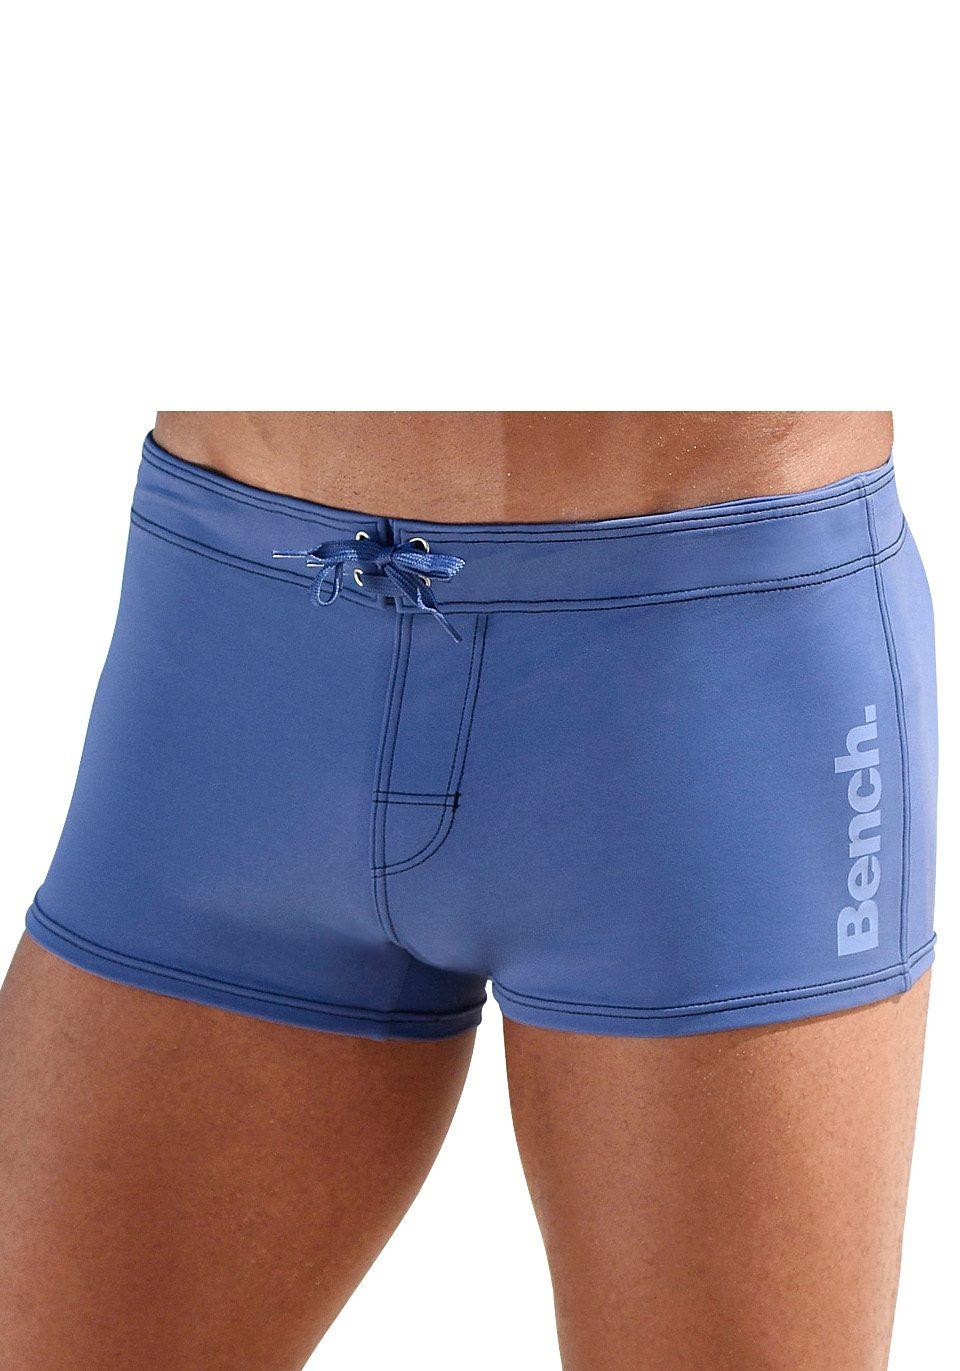 Bench. Boxer-Badehose | Bekleidung > Bademode > Boxerbadehosen | Bench.